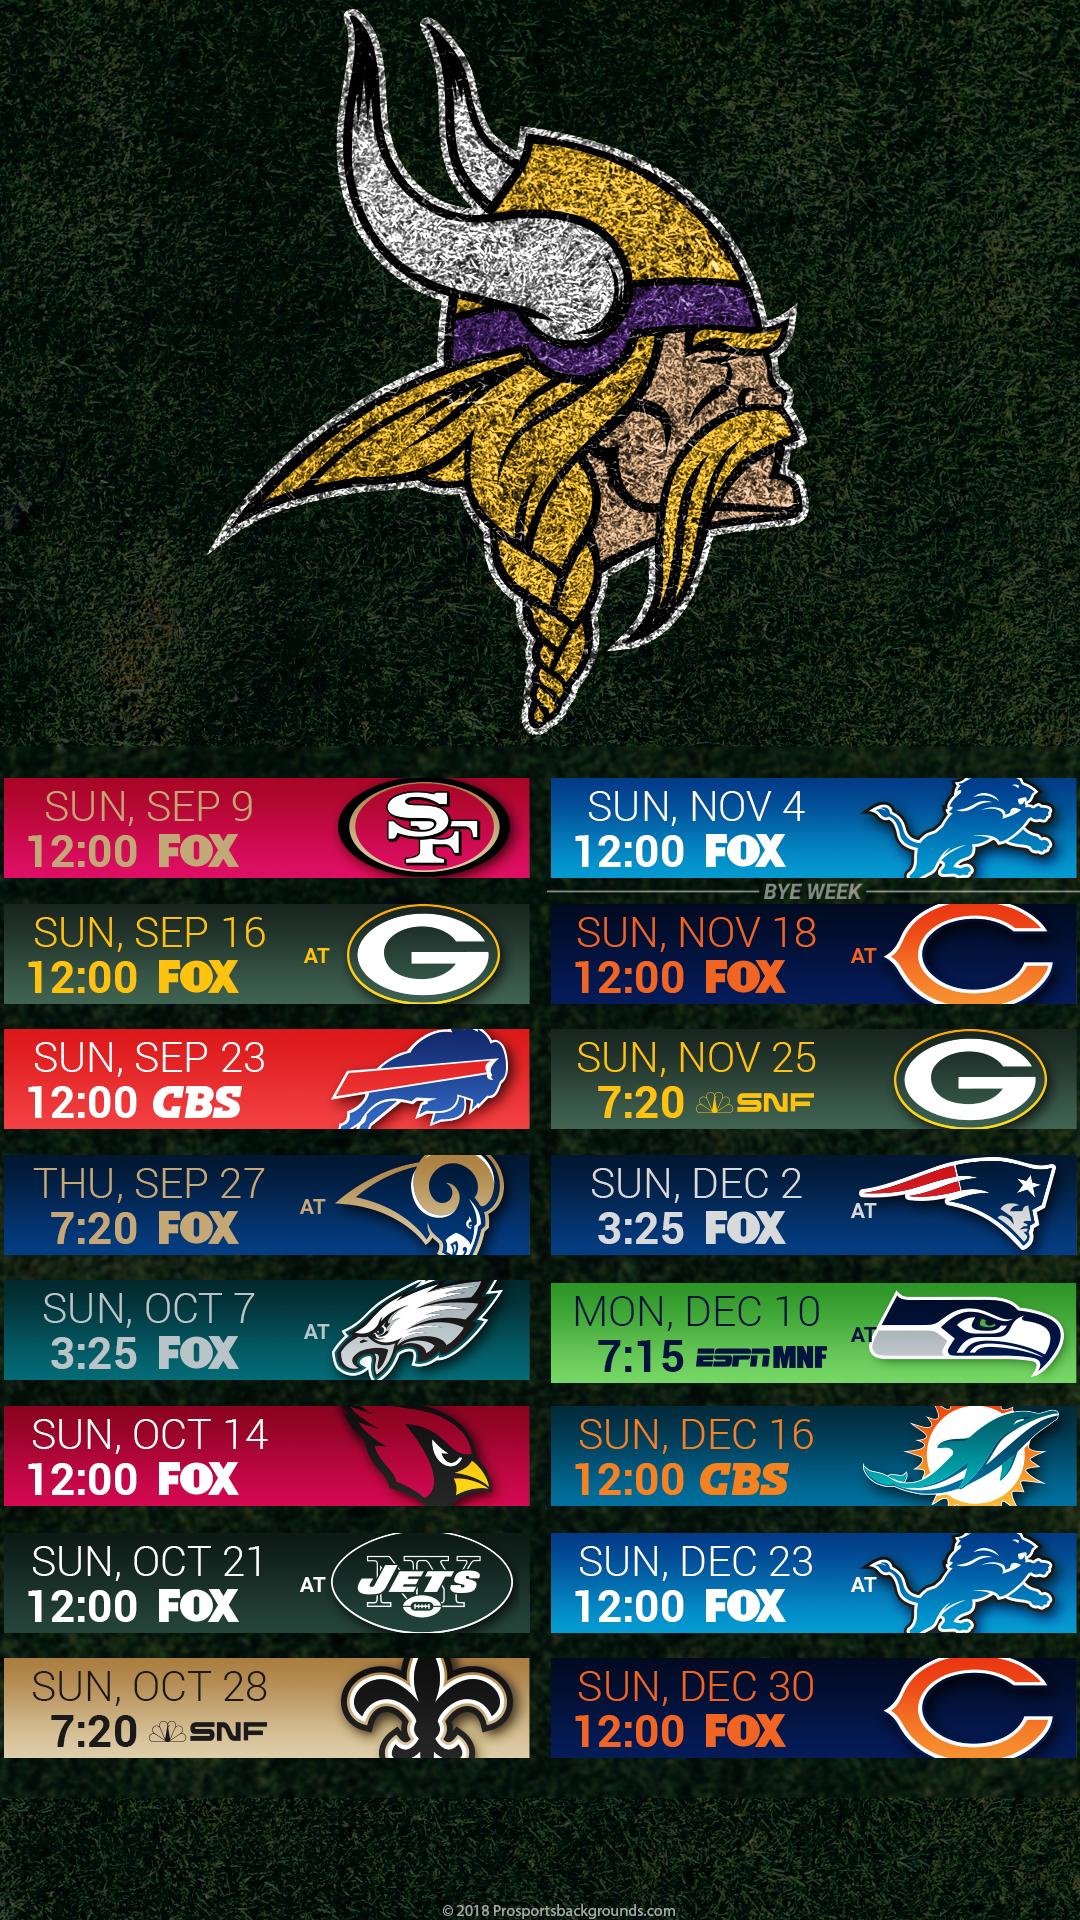 Minnesota Vikings 2018 Mobile Turf Schedule Wallpaper